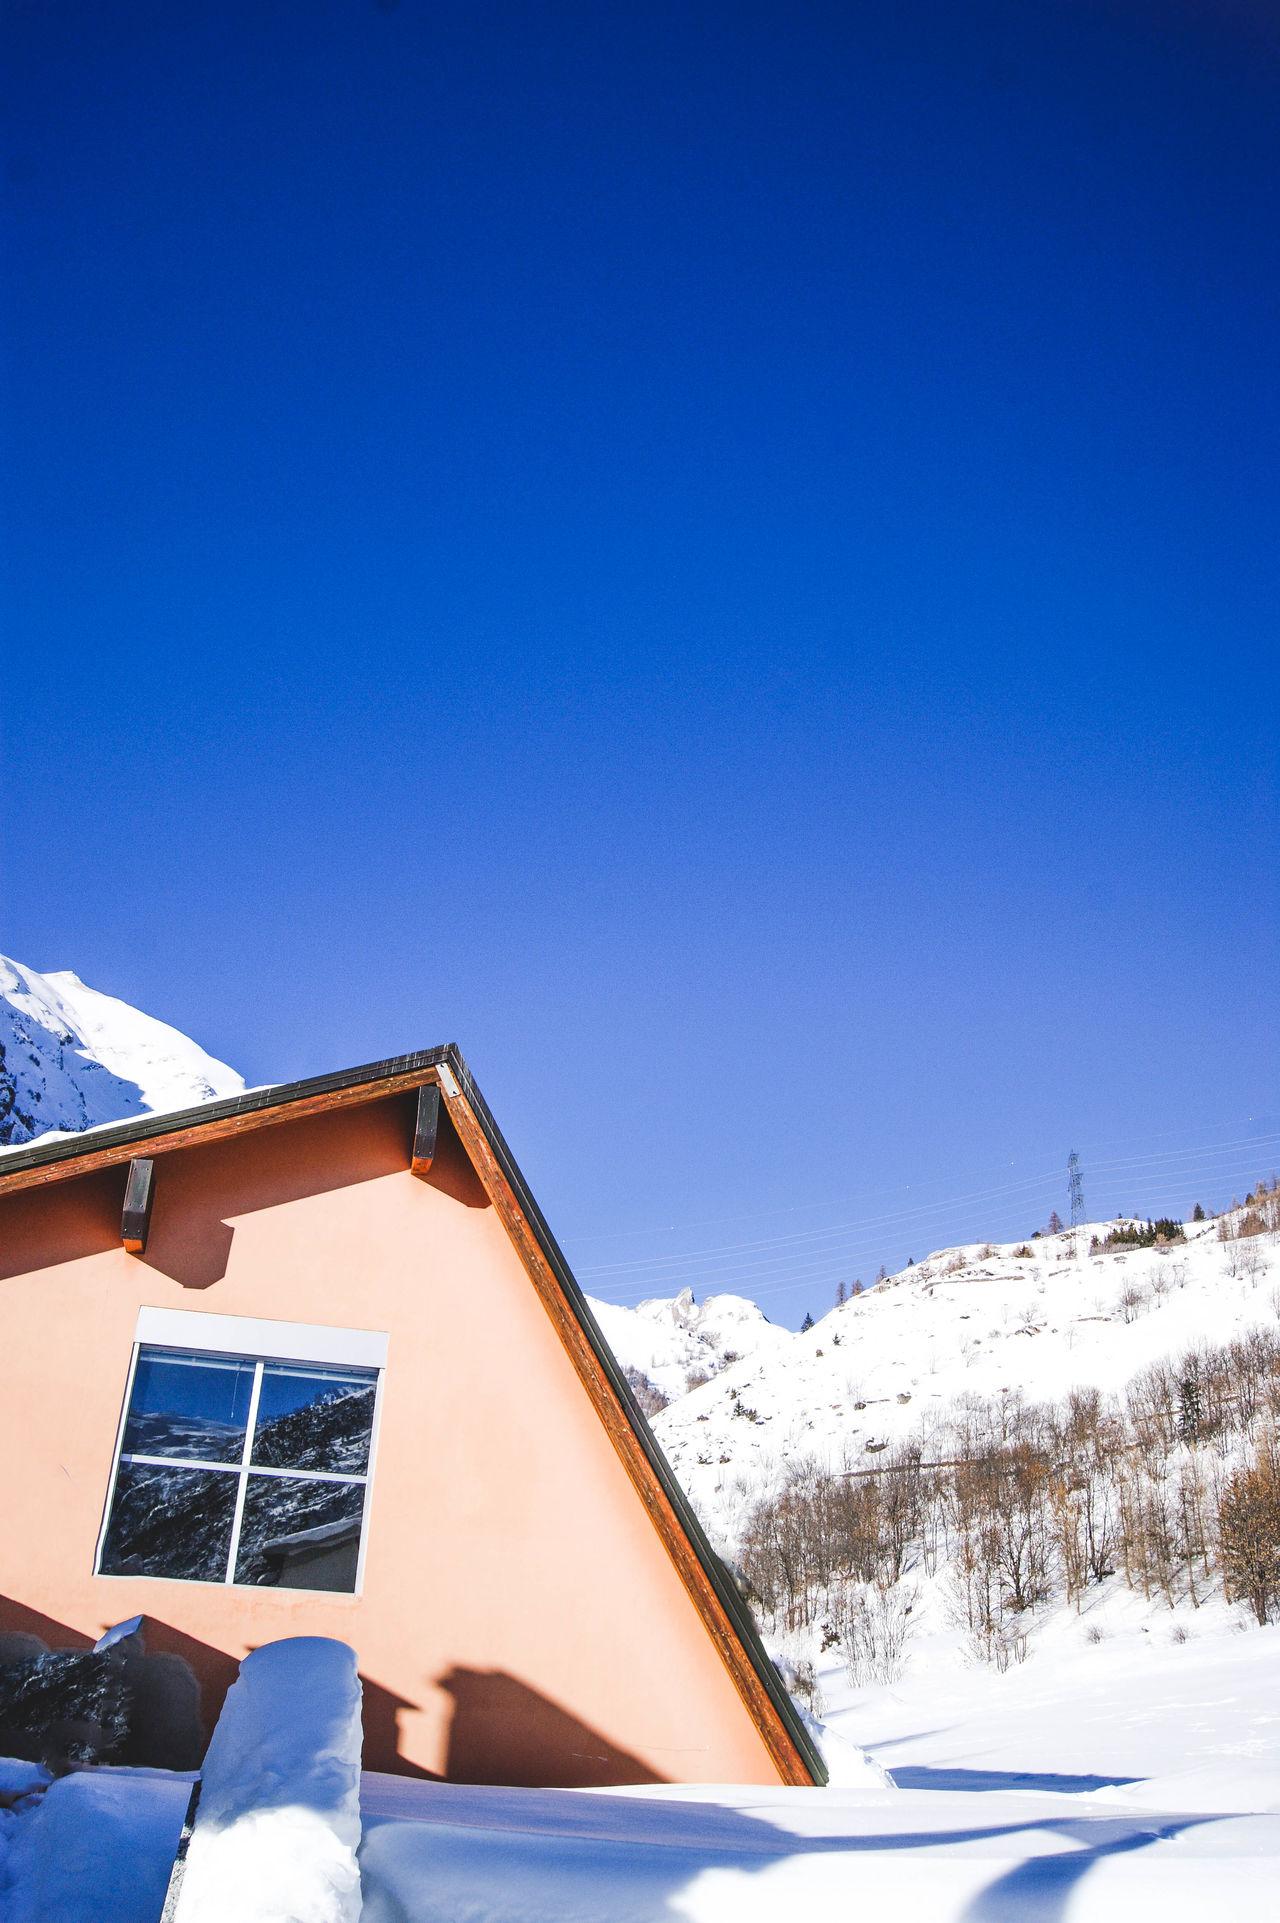 Beautiful stock photos of grafiken, blue, one person, sky, snow